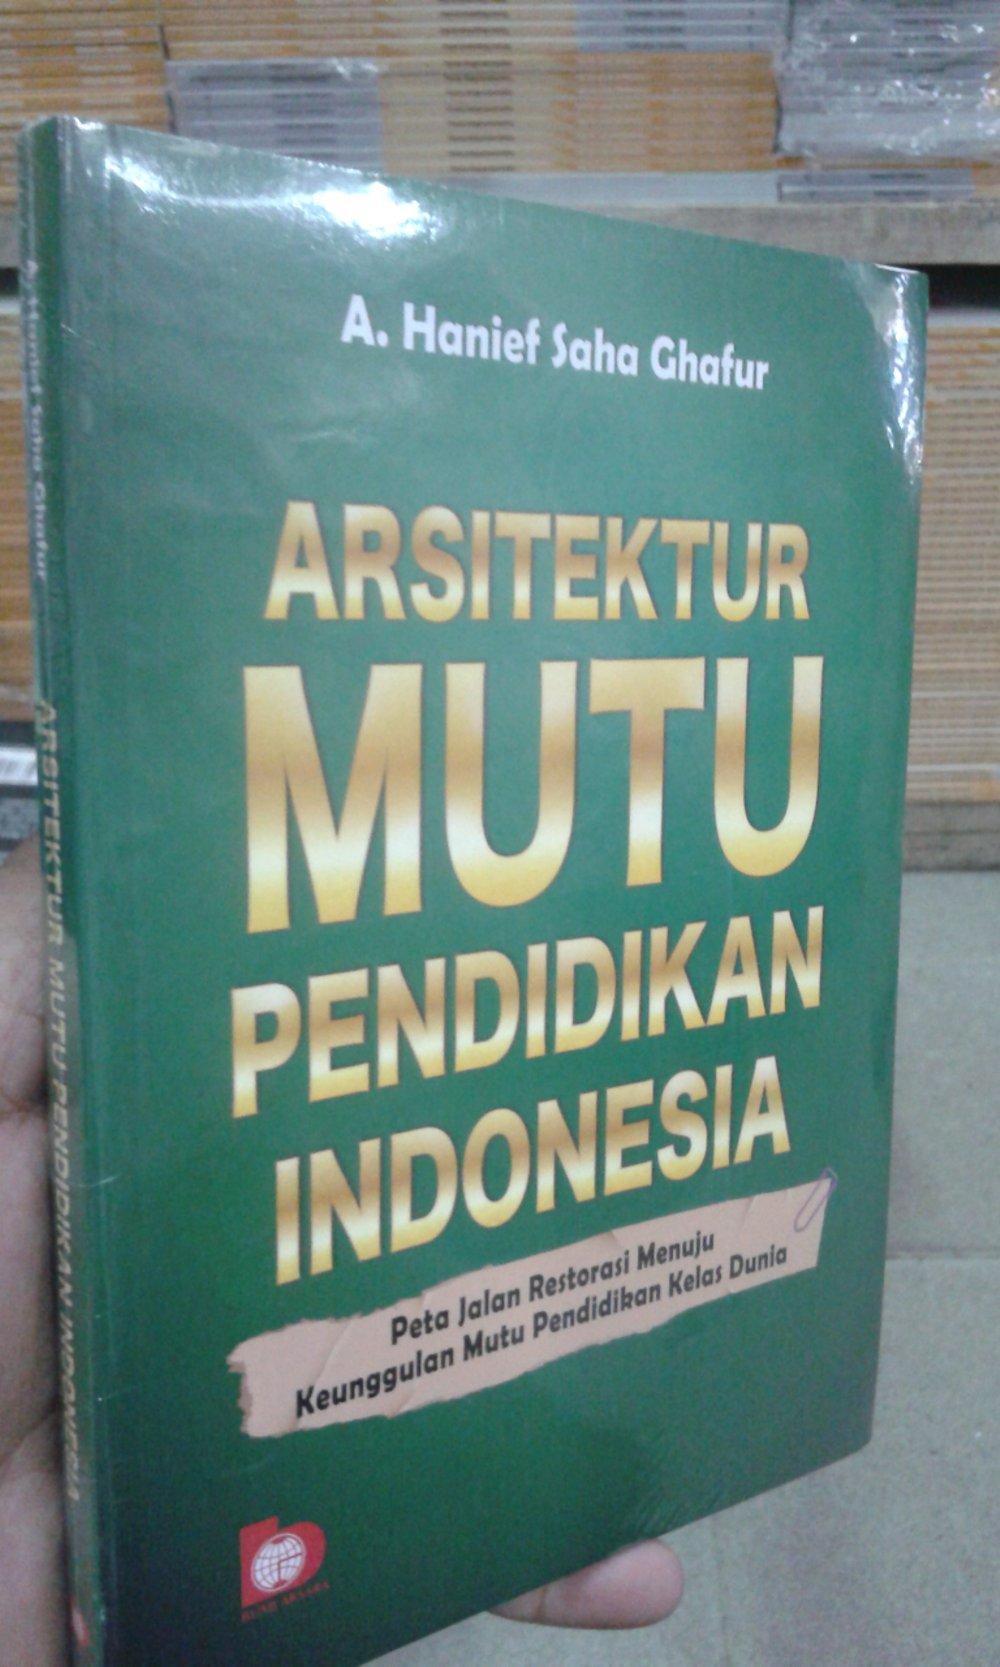 Buku Arsitektur Mutu Pendidikan Indonesia - Hanief Saha Ghafur